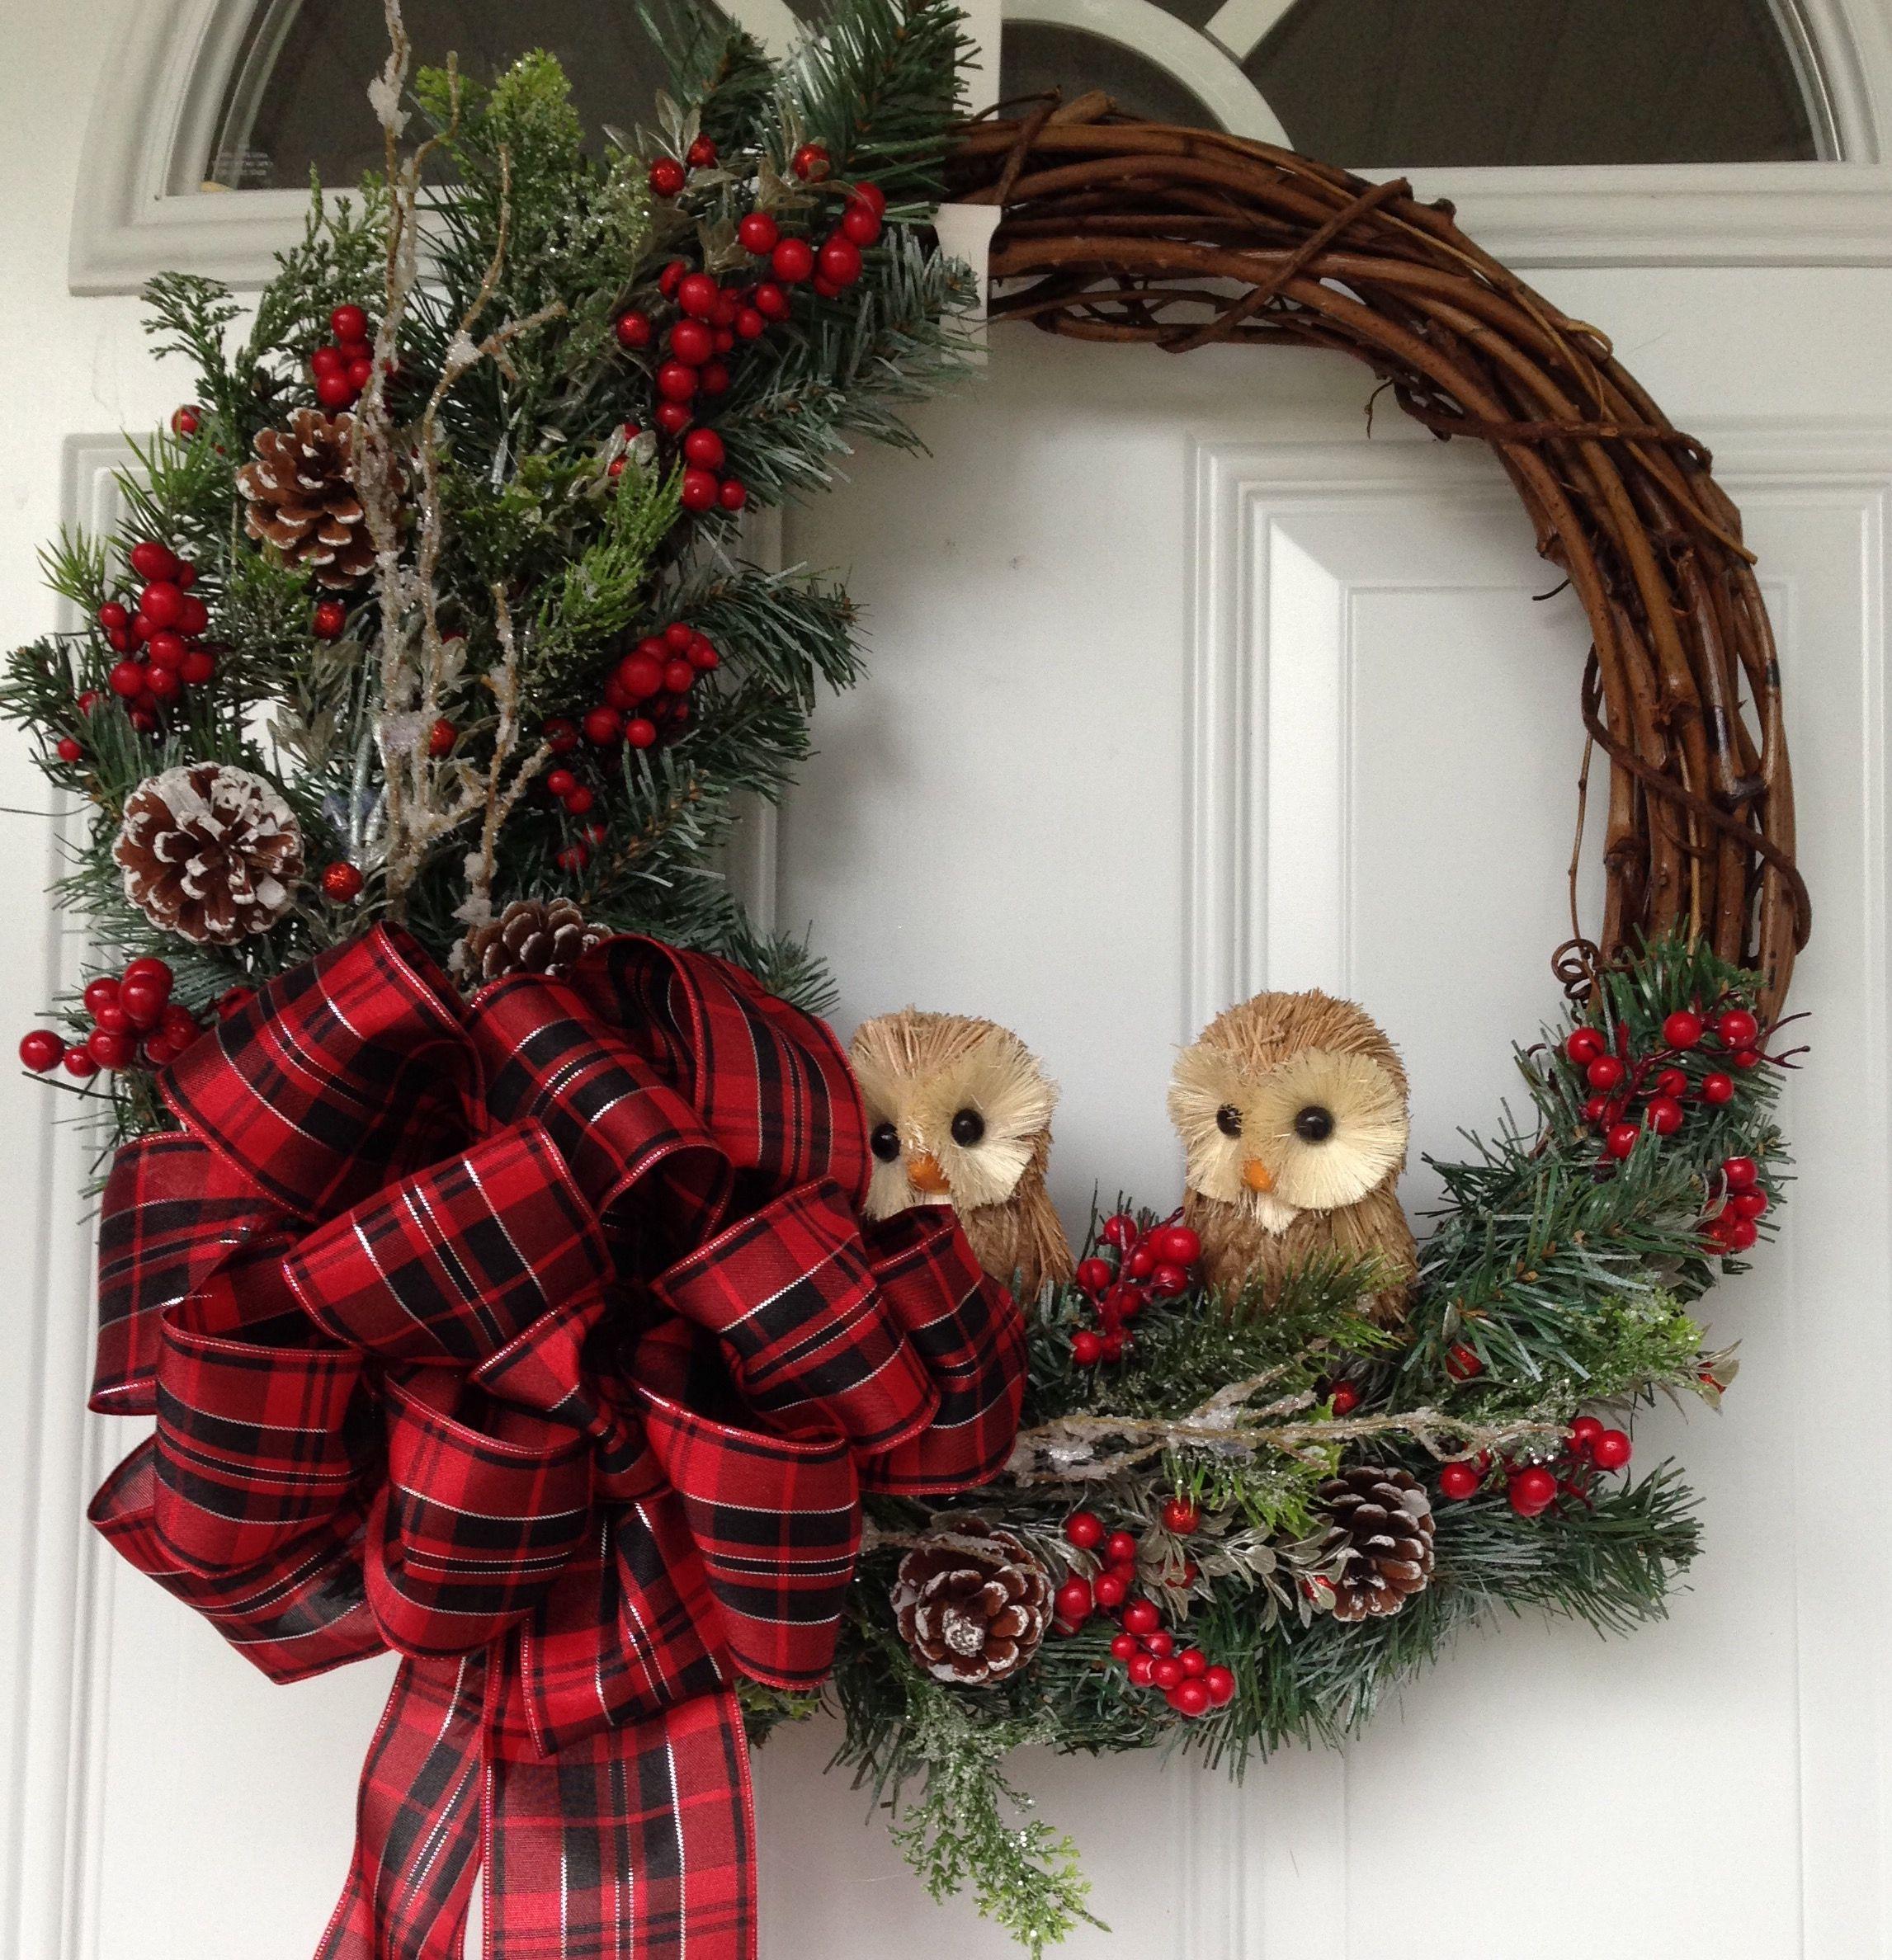 Pin de Martha Roa en Navidad b hos o pajaros Pinterest